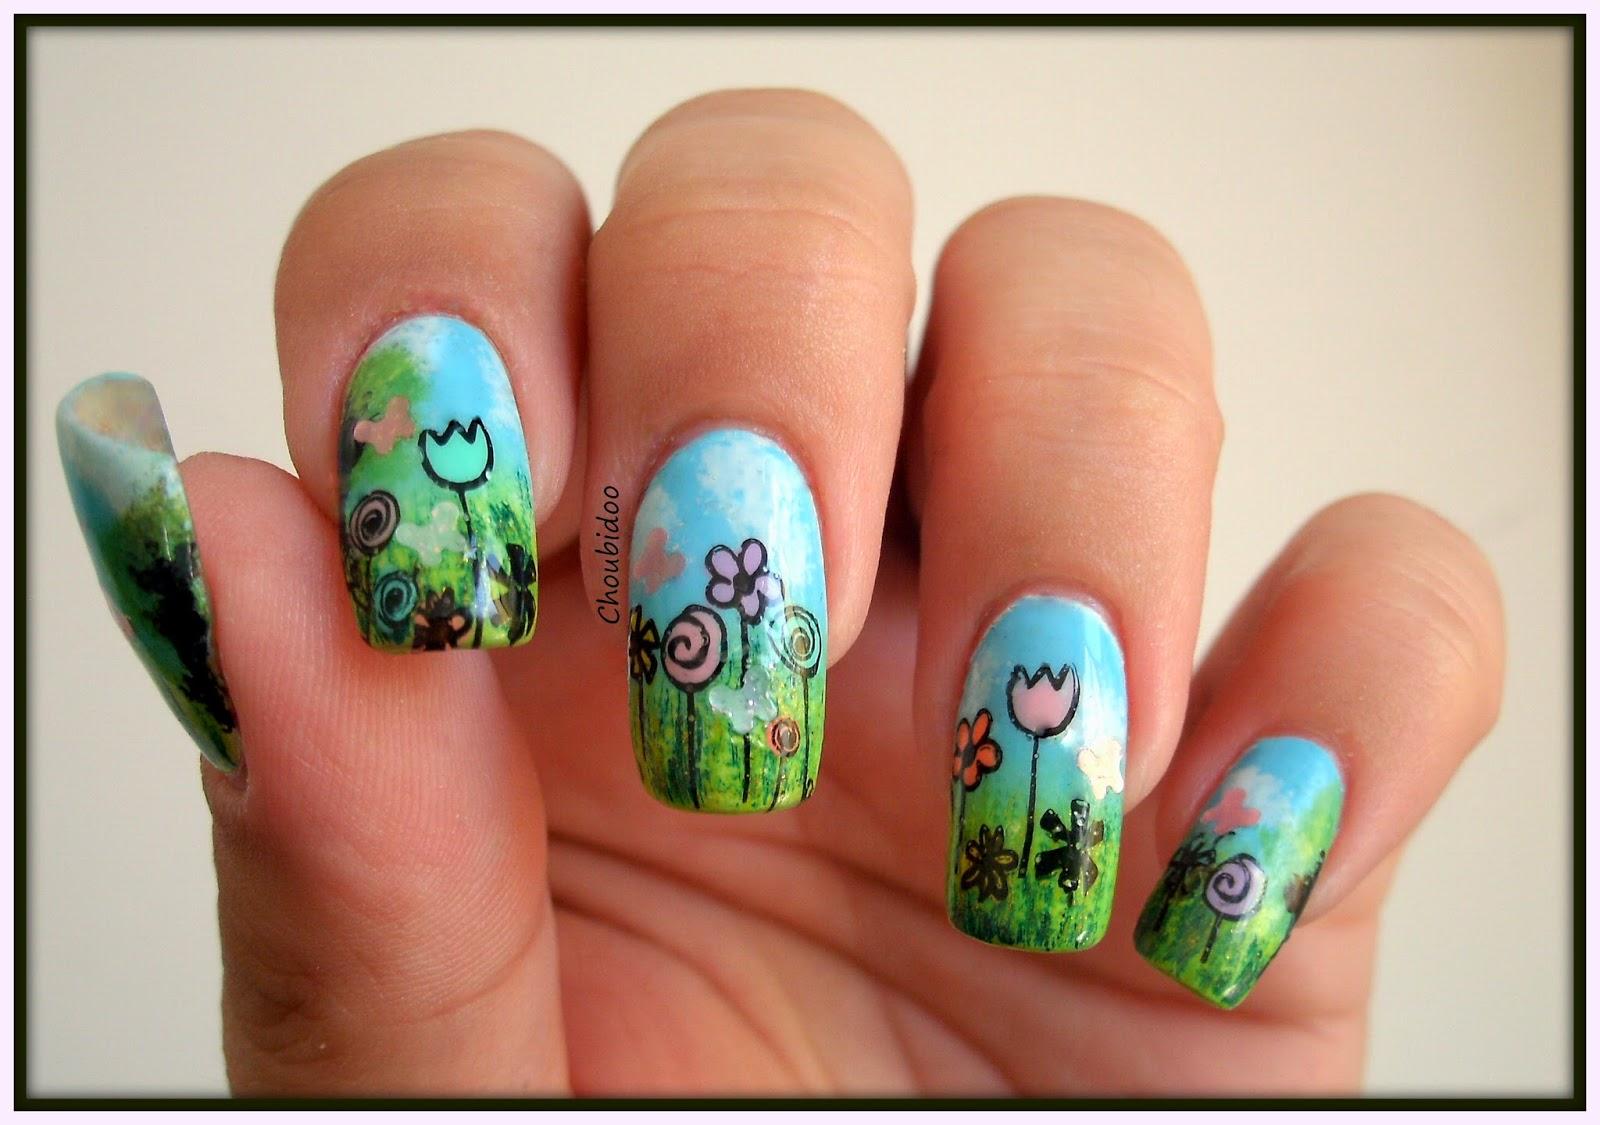 Nail art by choubidoo nail art printemps - Nail art printemps ...